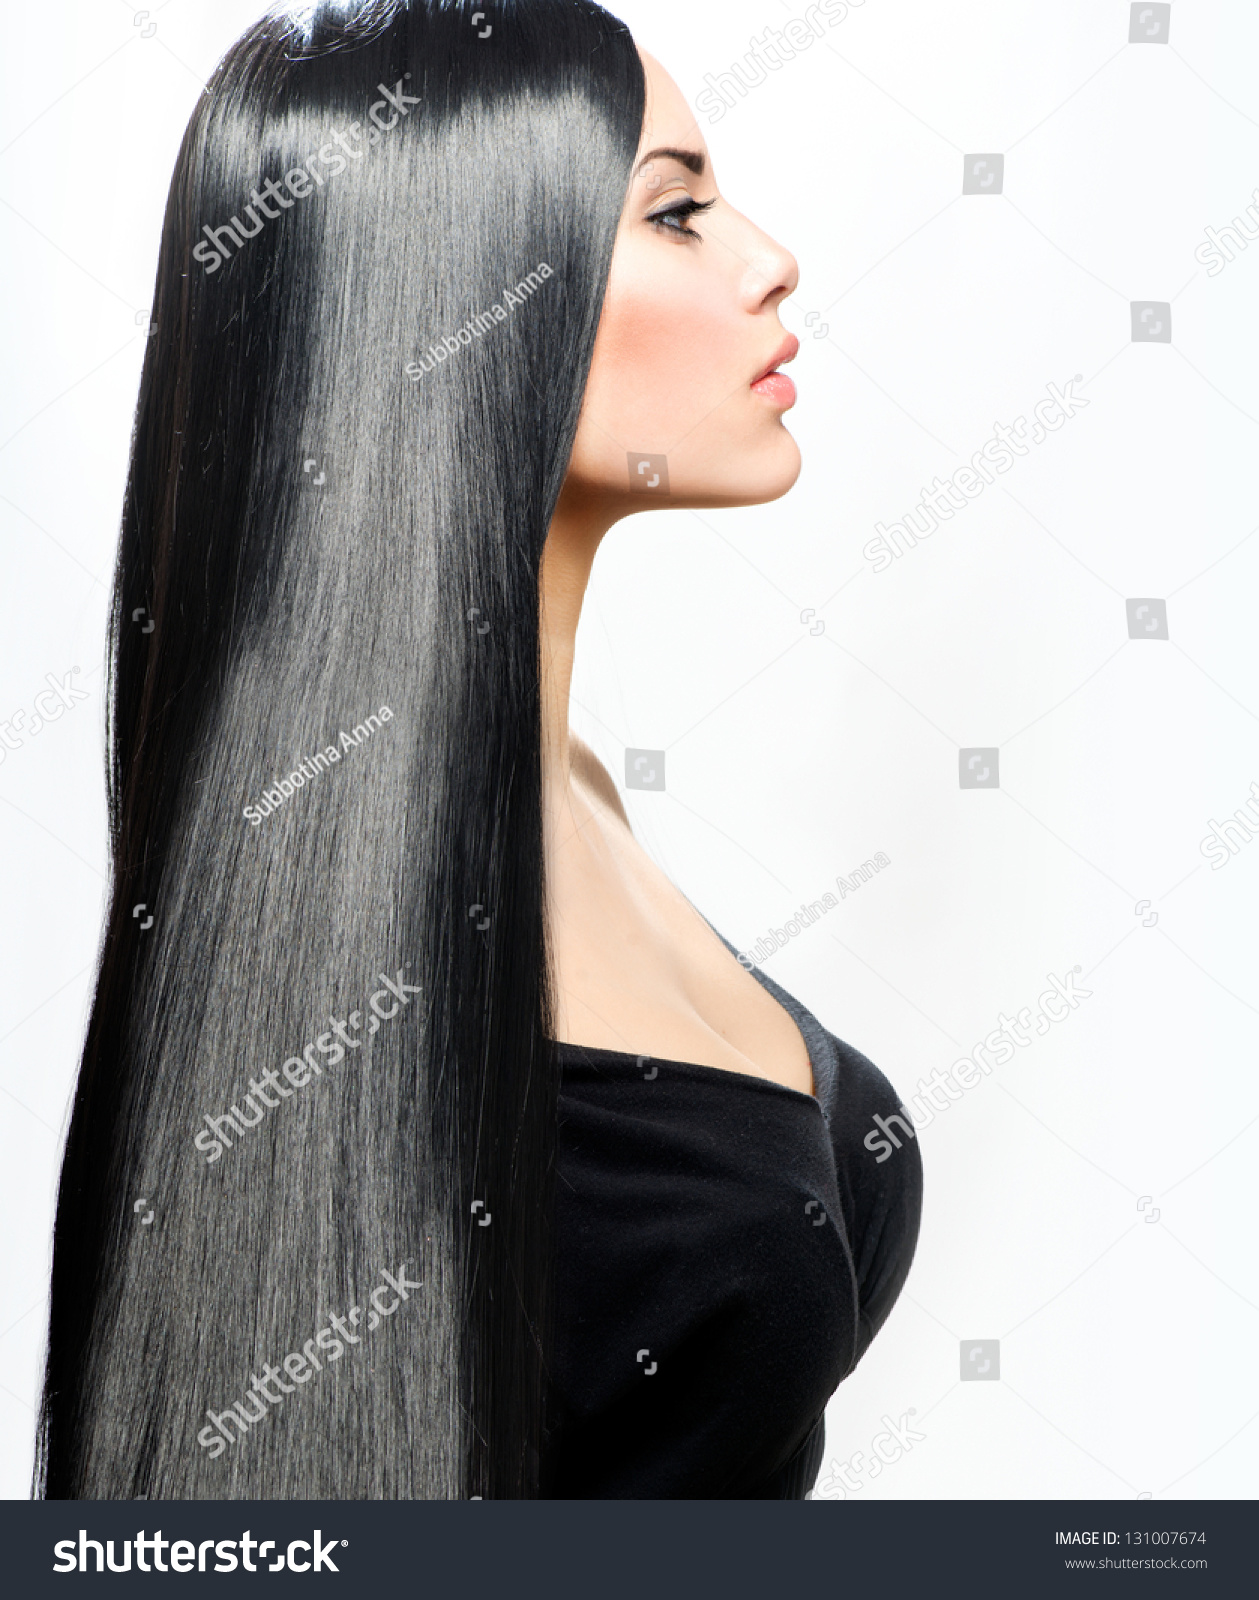 Hair Beauty Girl Long Straight Black Stock Photo 131007674 ...